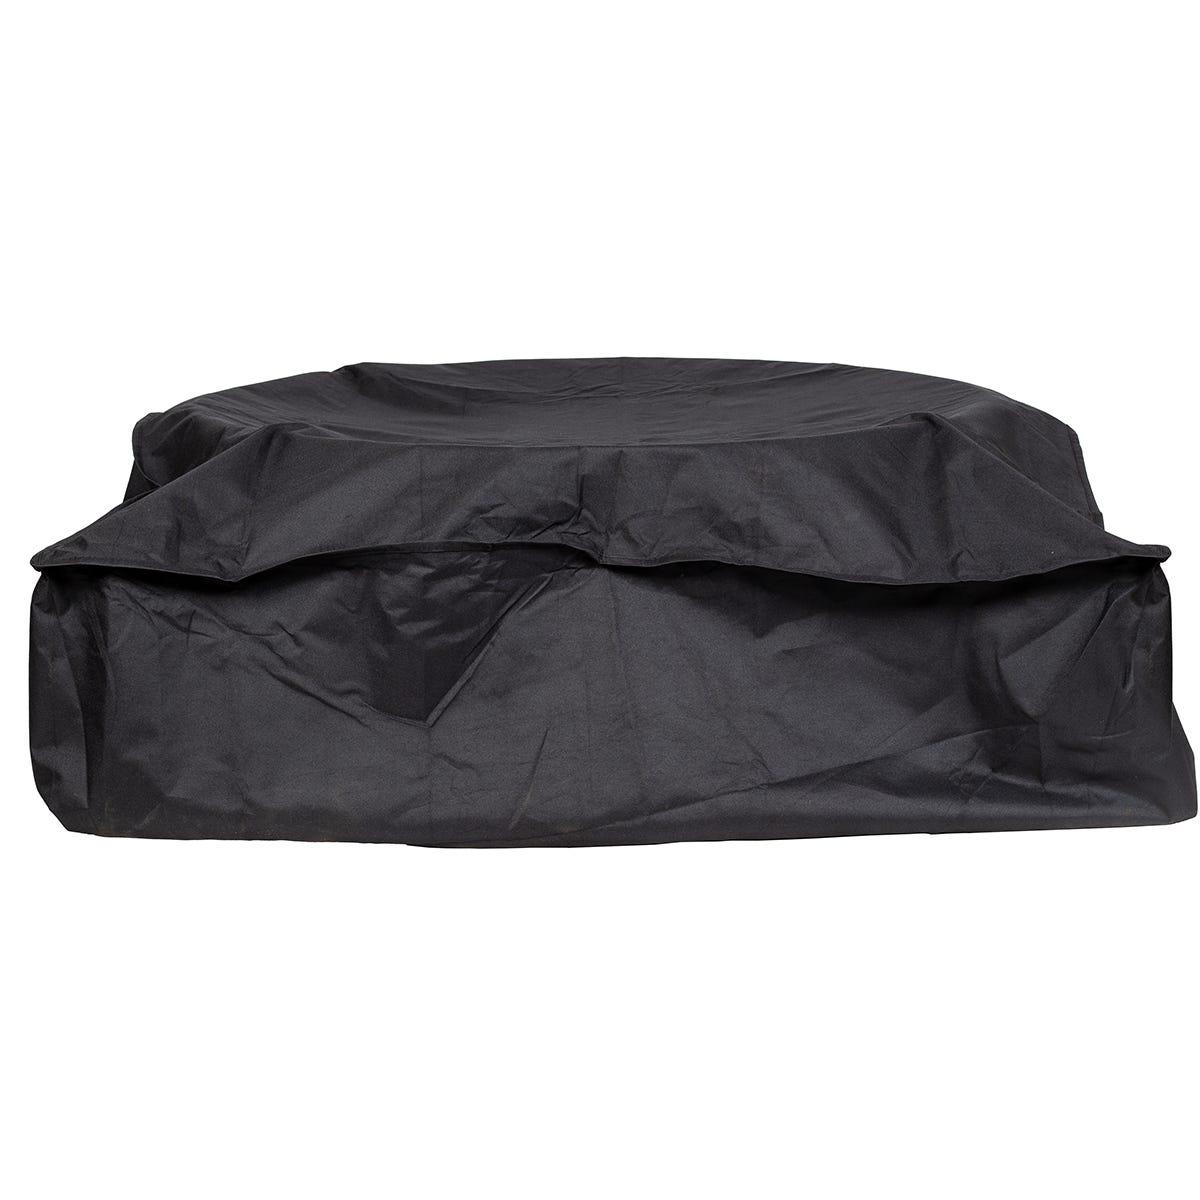 La Hacienda Premium Firepit Cover Extra Wide - Black